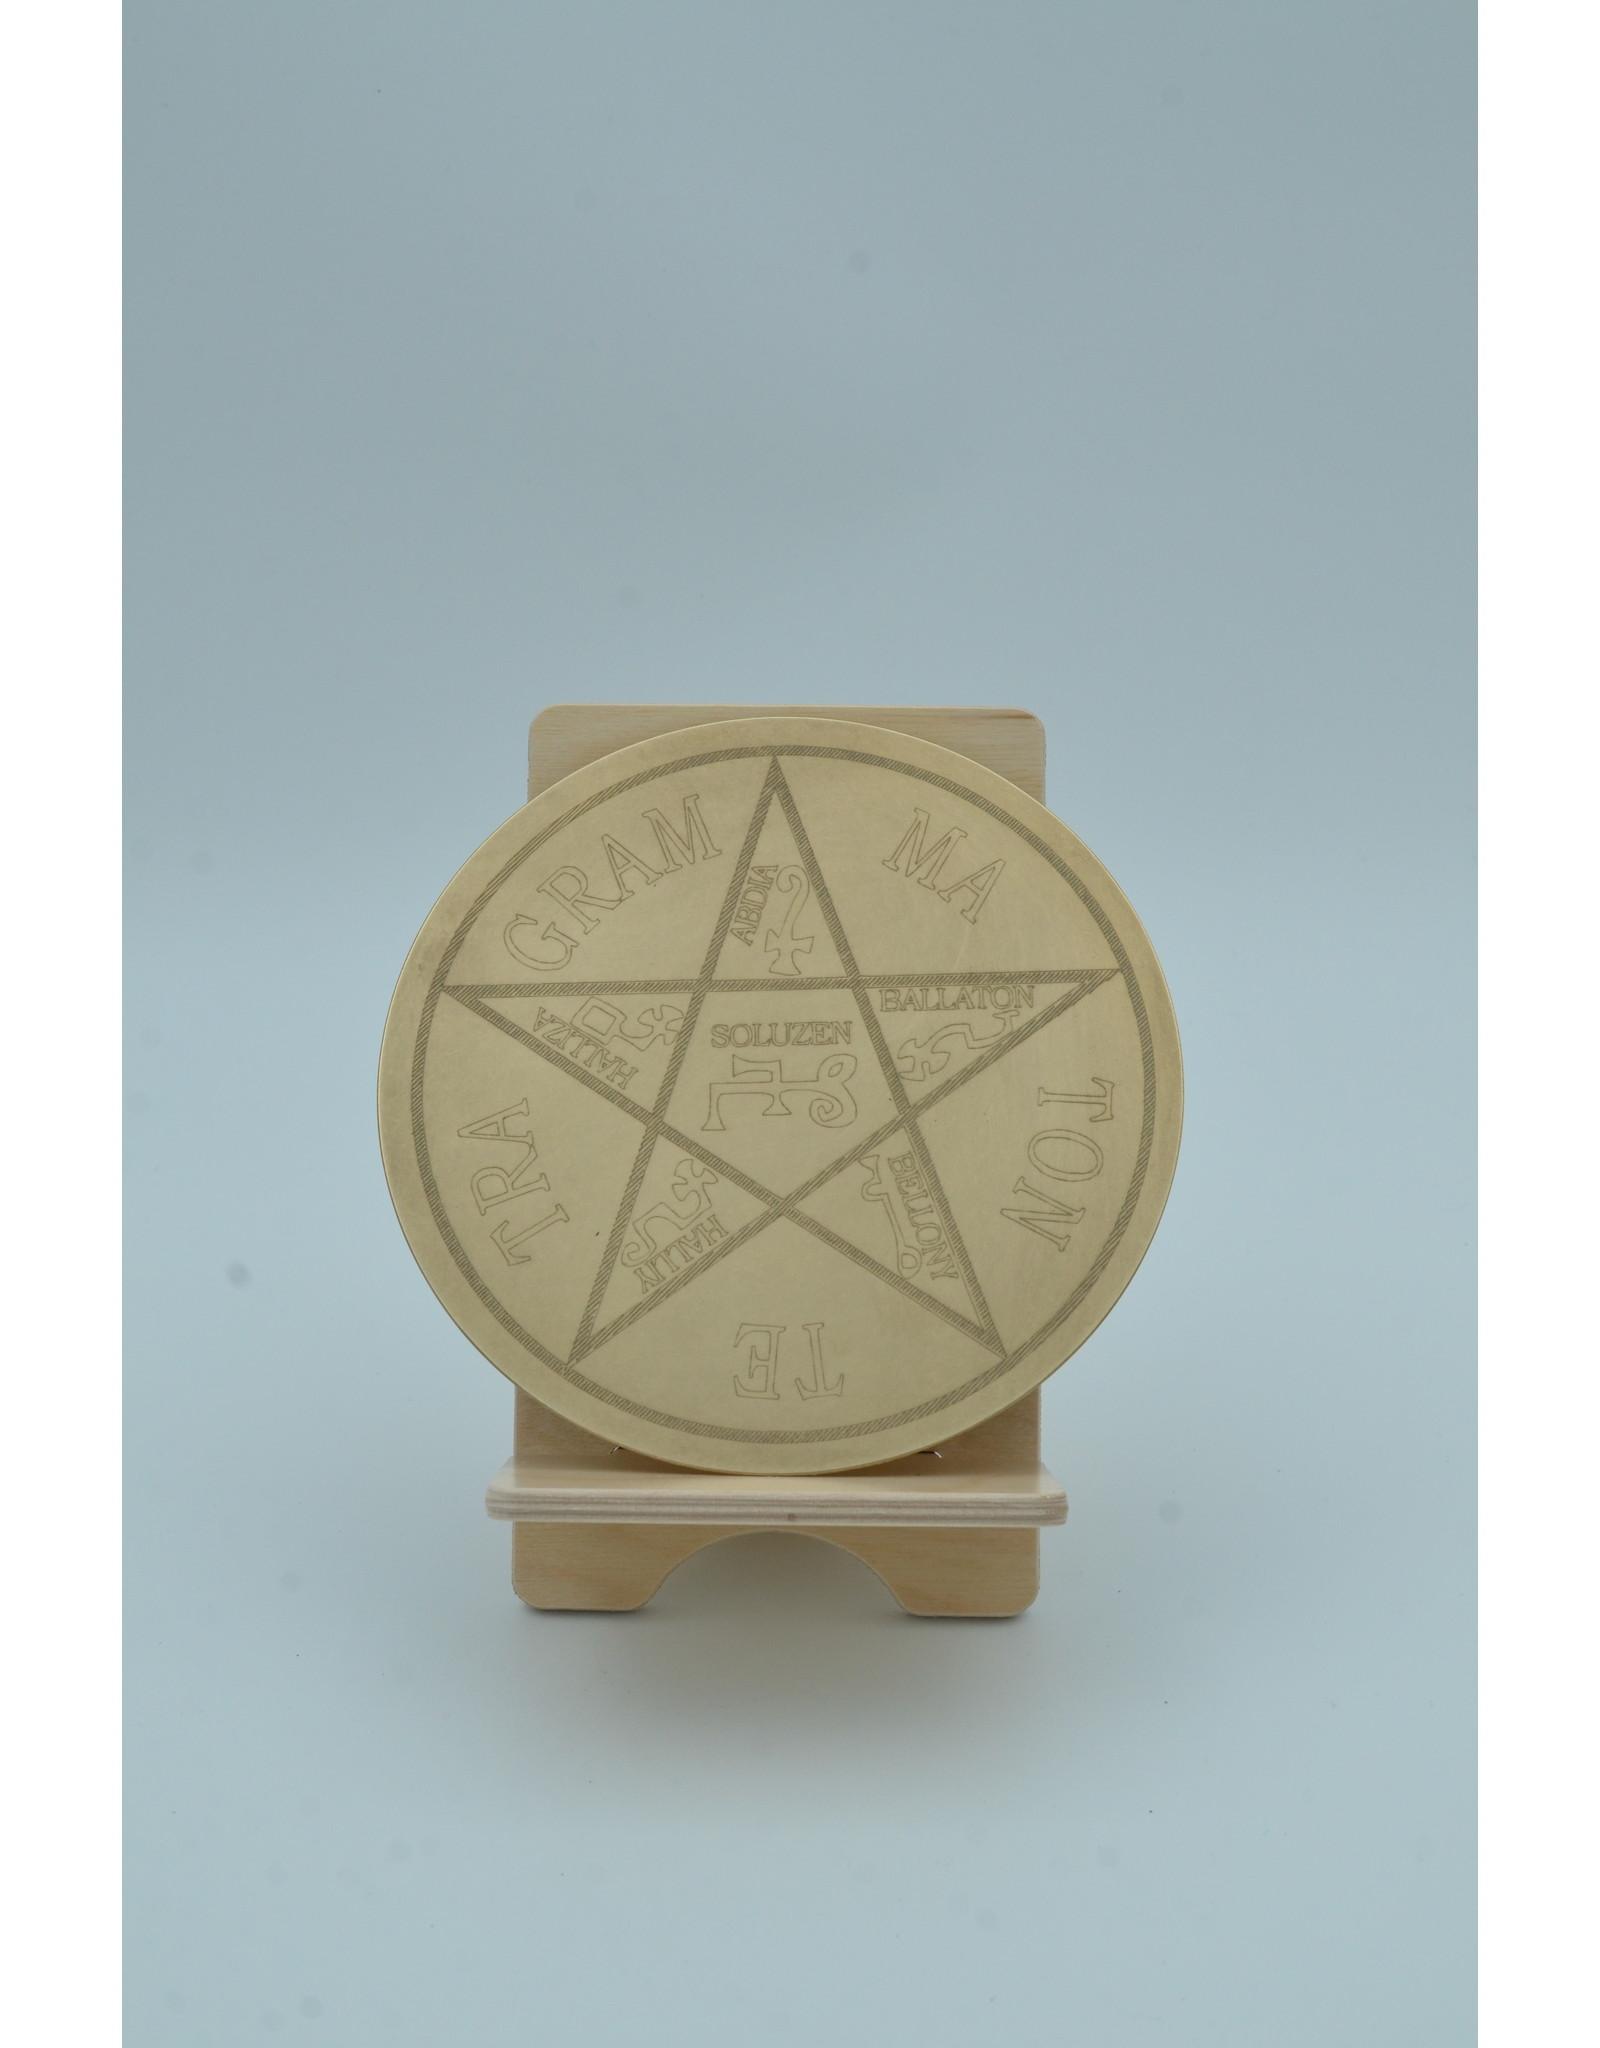 Tetragrammaton Altar Disk 6 inch Brass